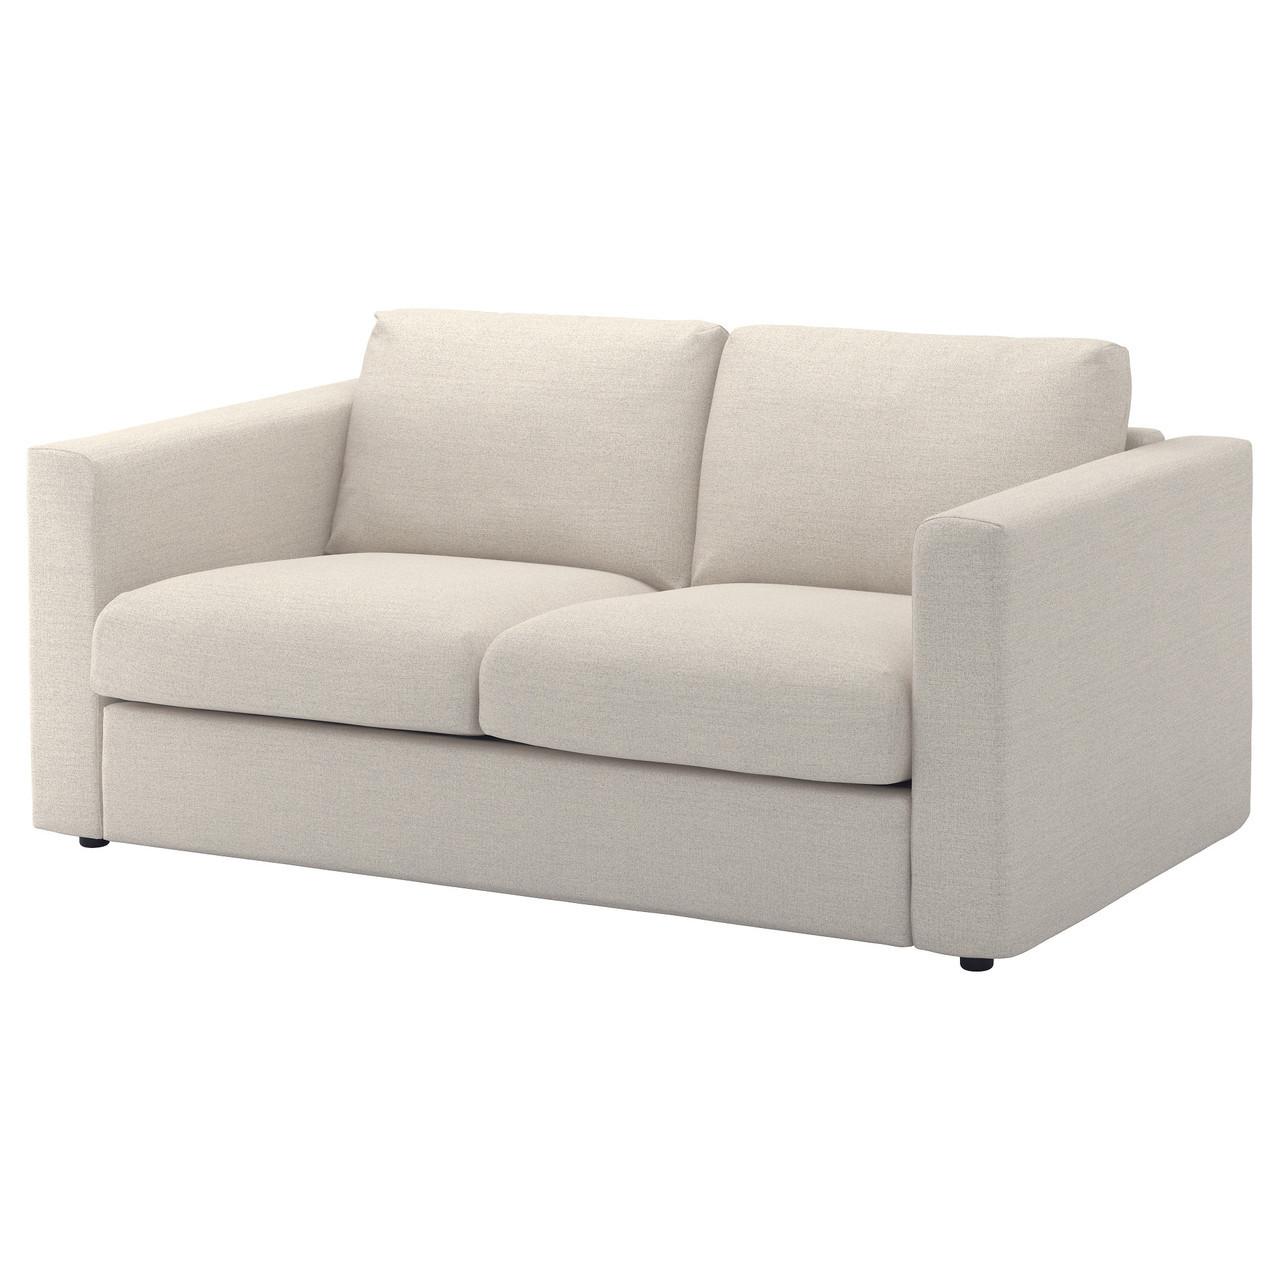 IKEA VIMLE (492.855.82) VIMLE 2-местный диван-кровать, Gunnared бежевый